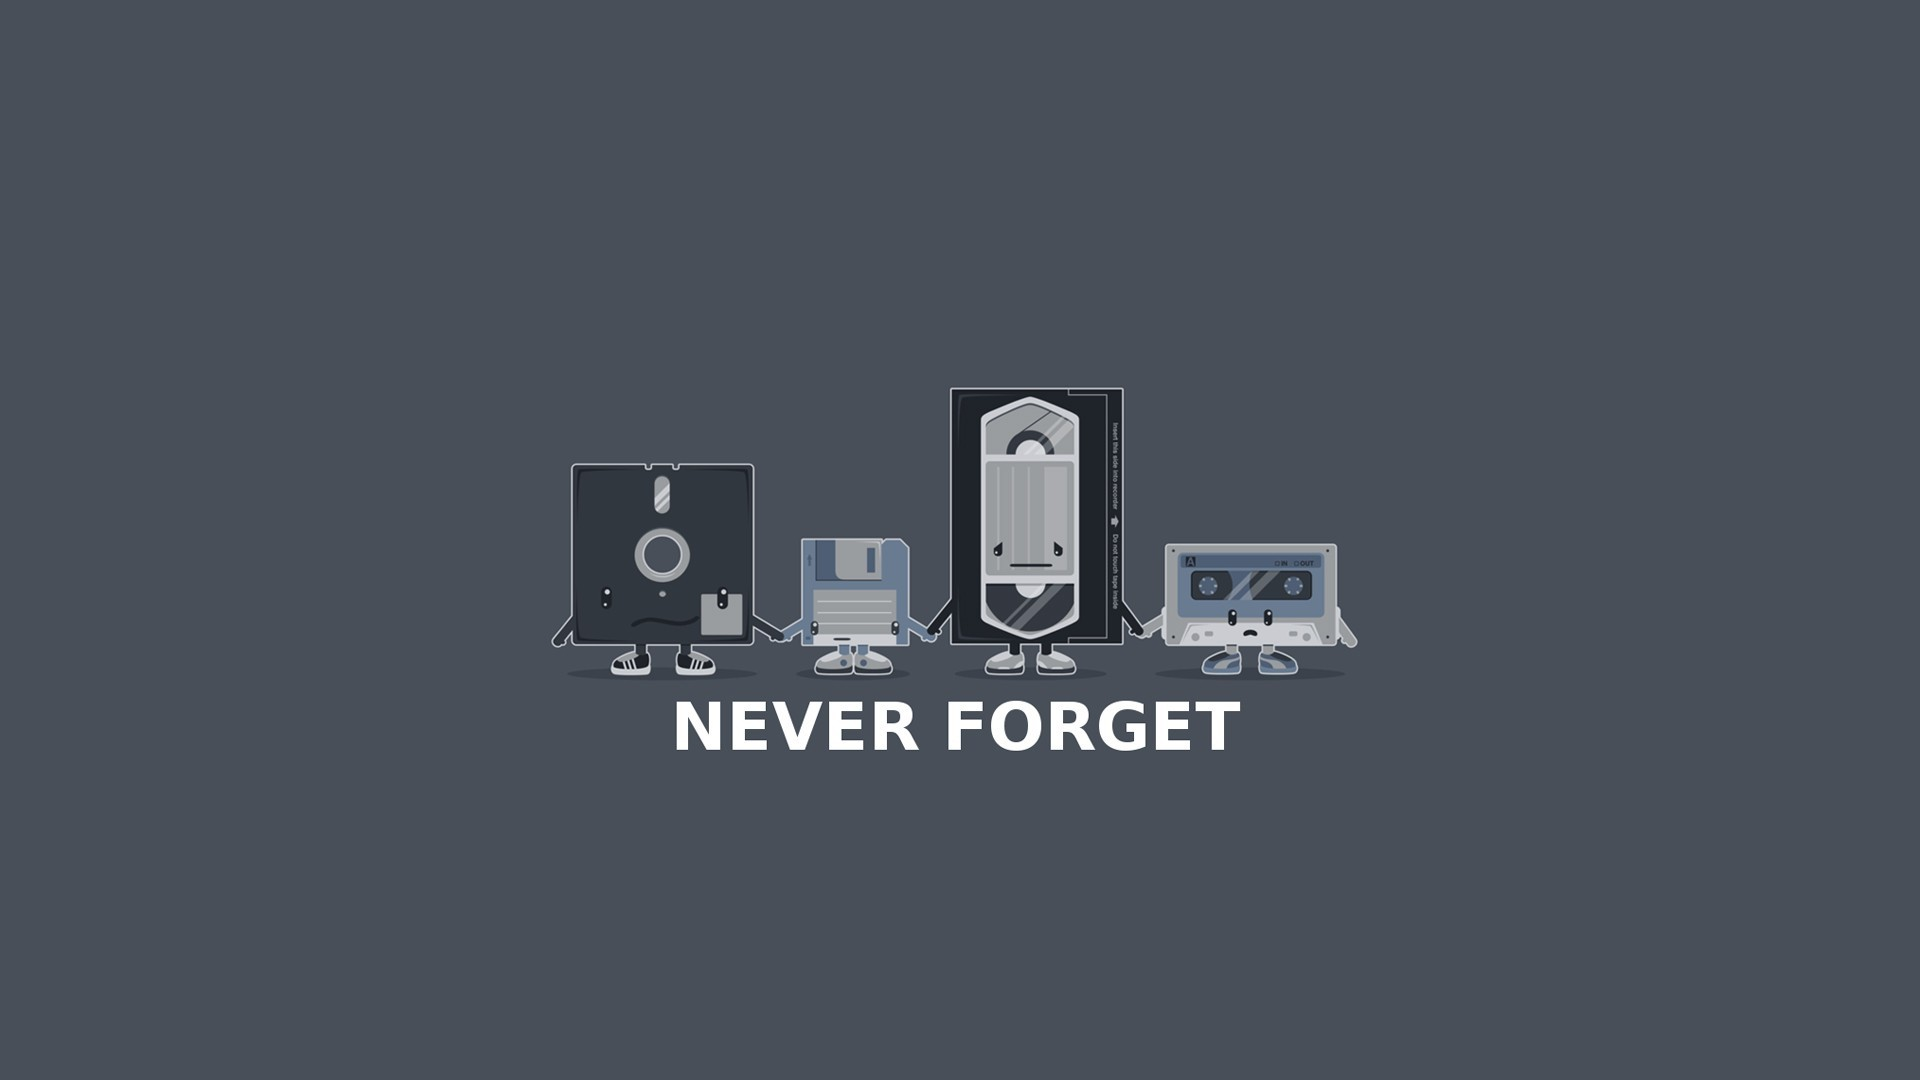 humor computer vhs floppy disk digital art simple background nostalgia vintage minimalism tape gray